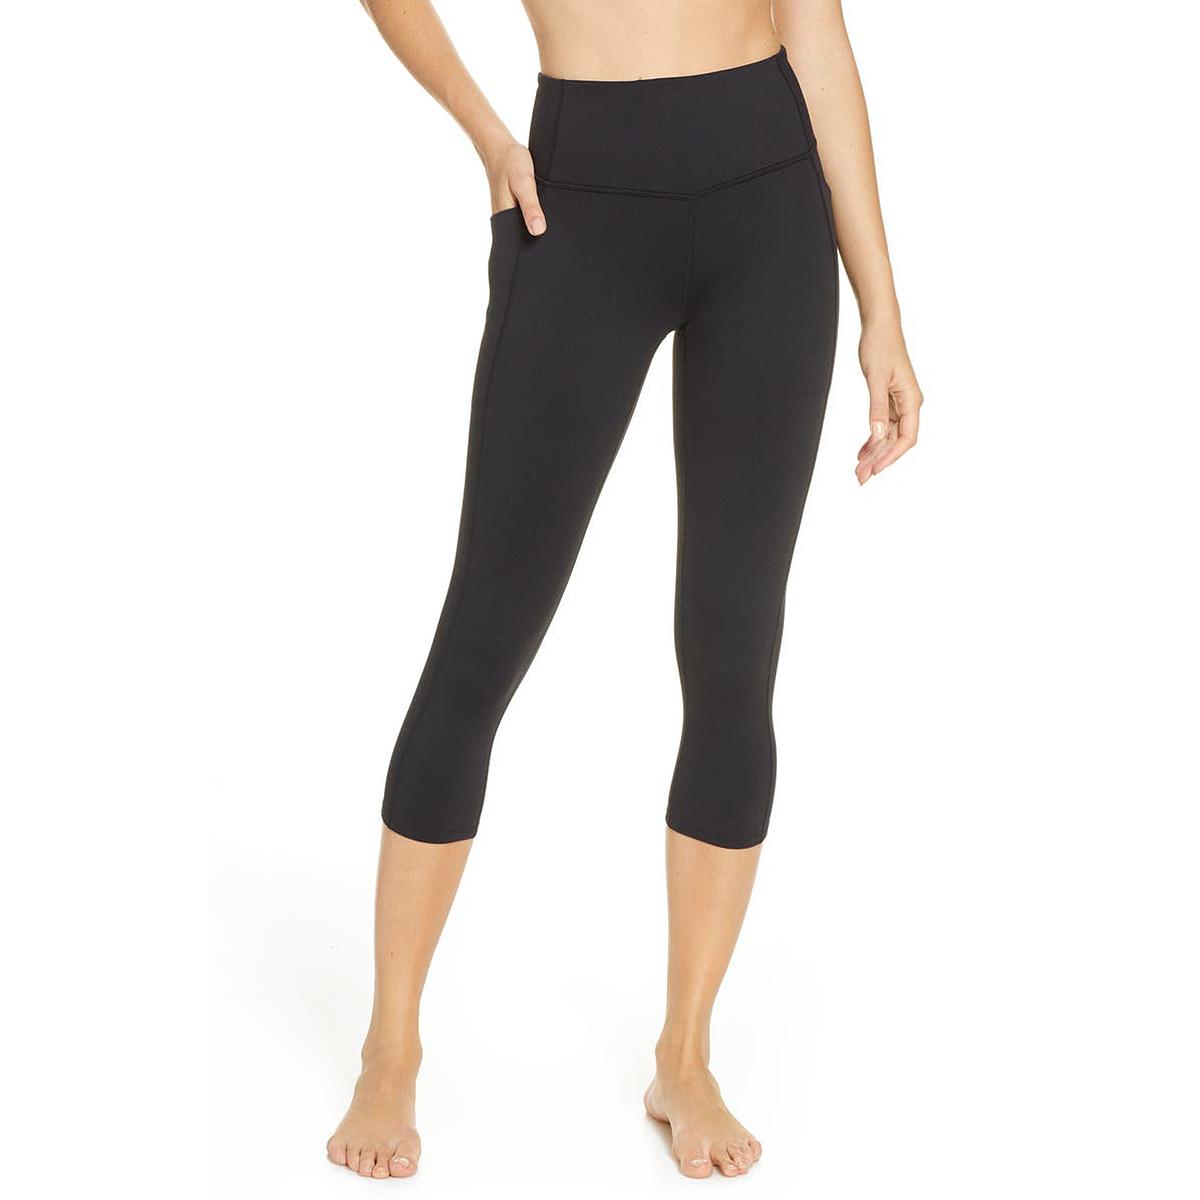 zella-live-in-leggings-nordstrom-anniversary-sale